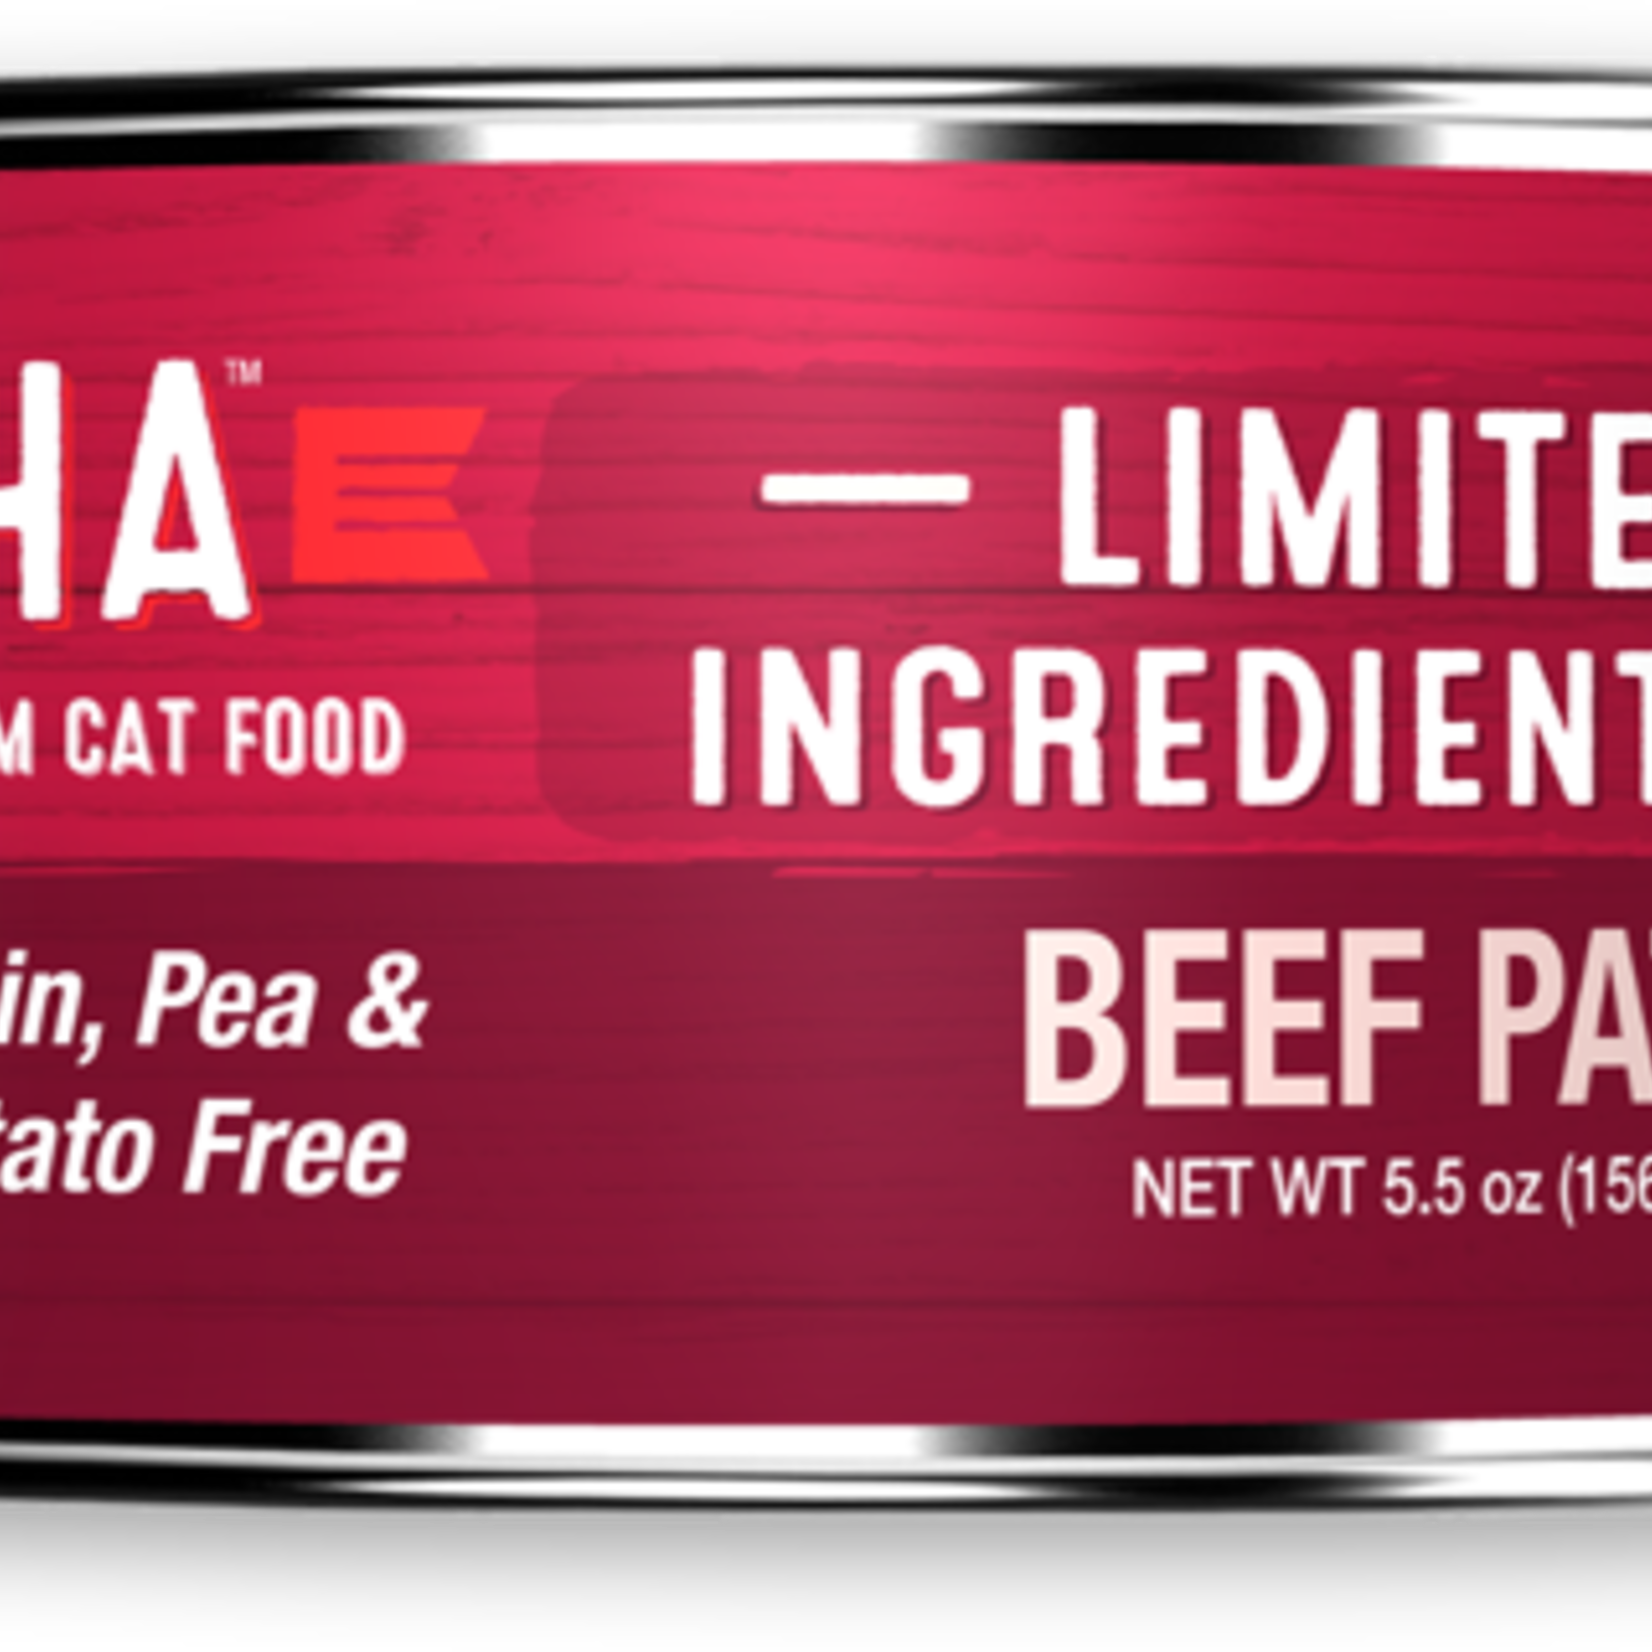 Koha Koha Cat Grain Free LID Beef Pate 5.5 OZ